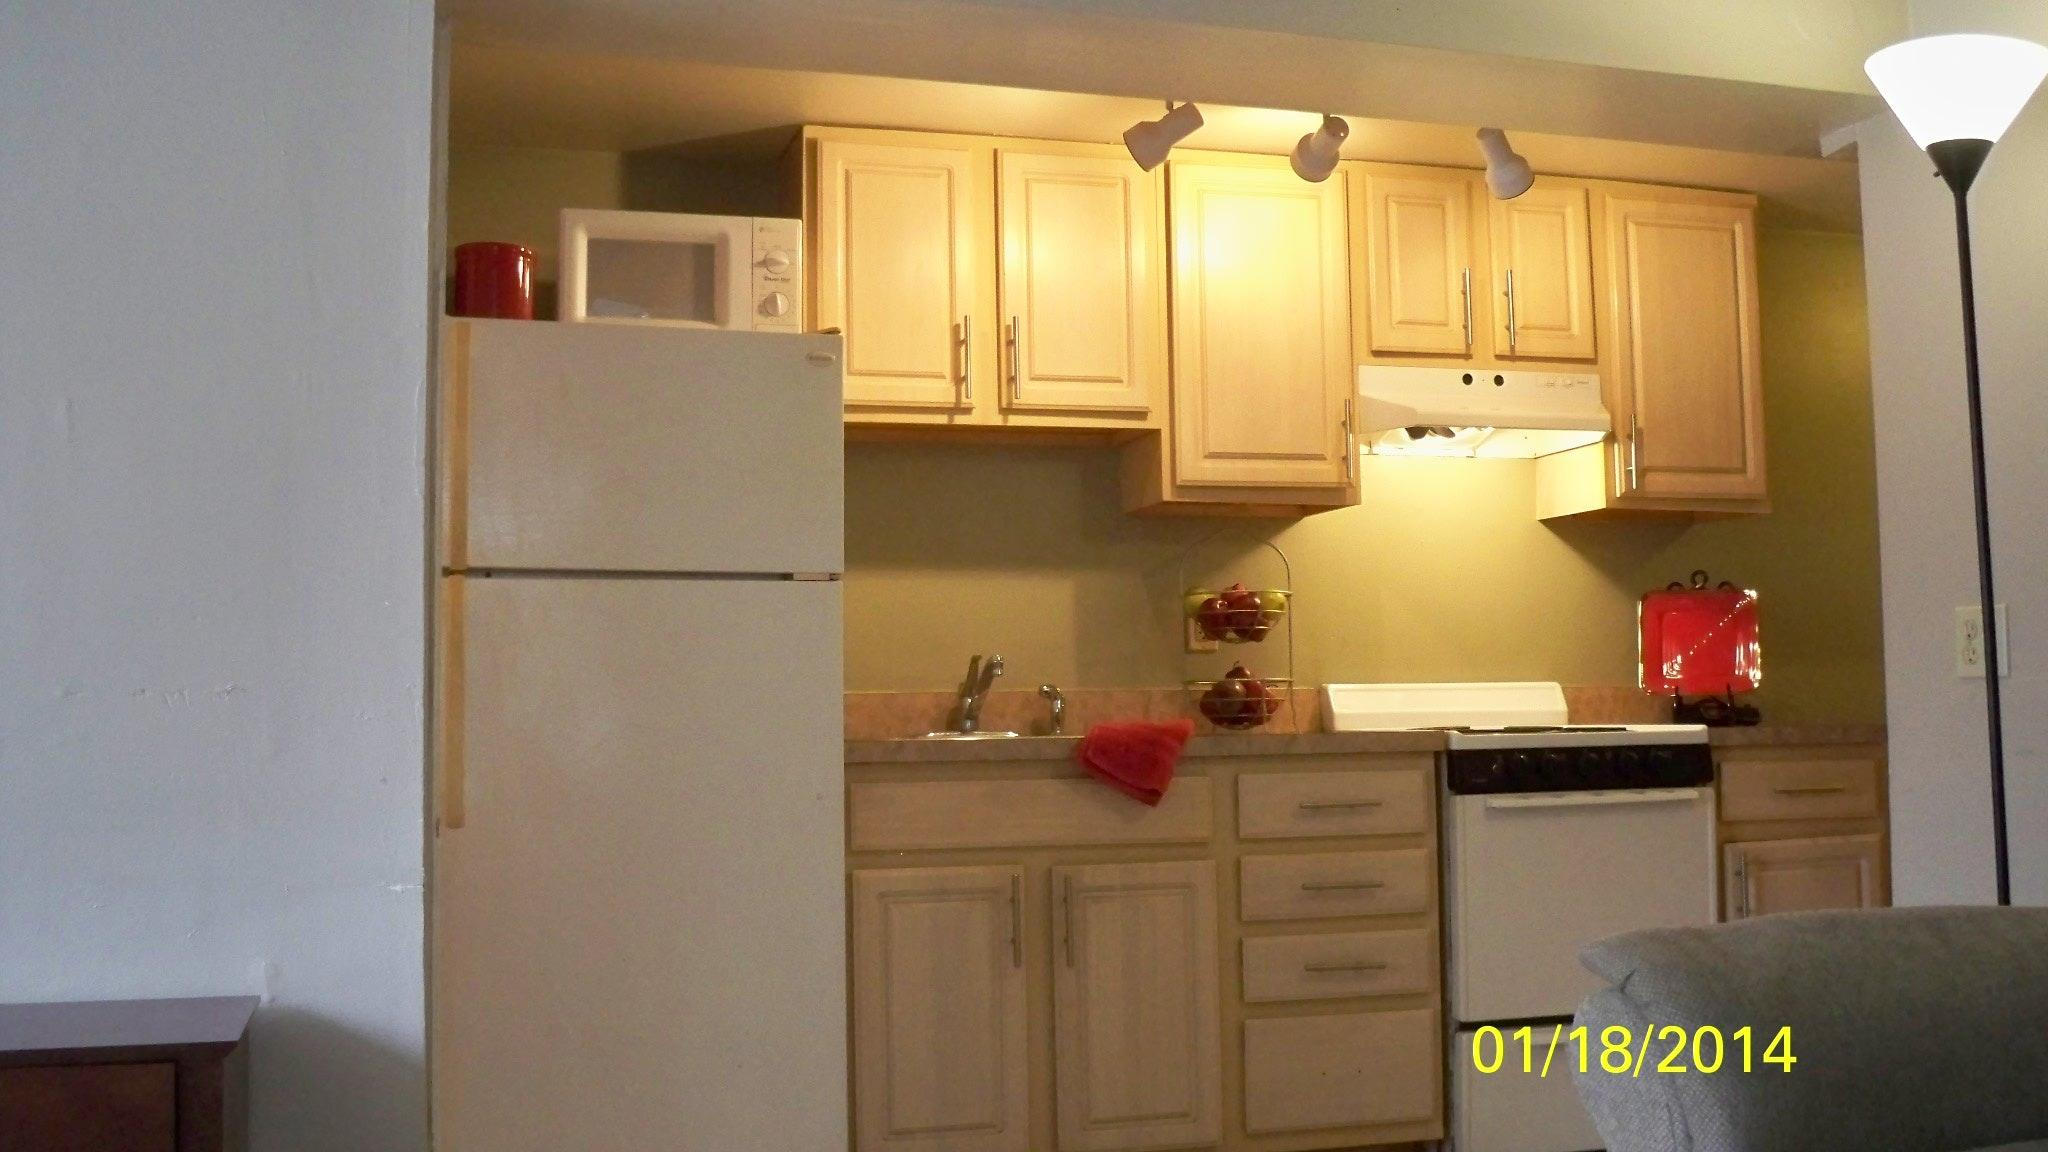 348 N 9th St #GARDEN, Allentown, PA 18102 For Rent | Trulia